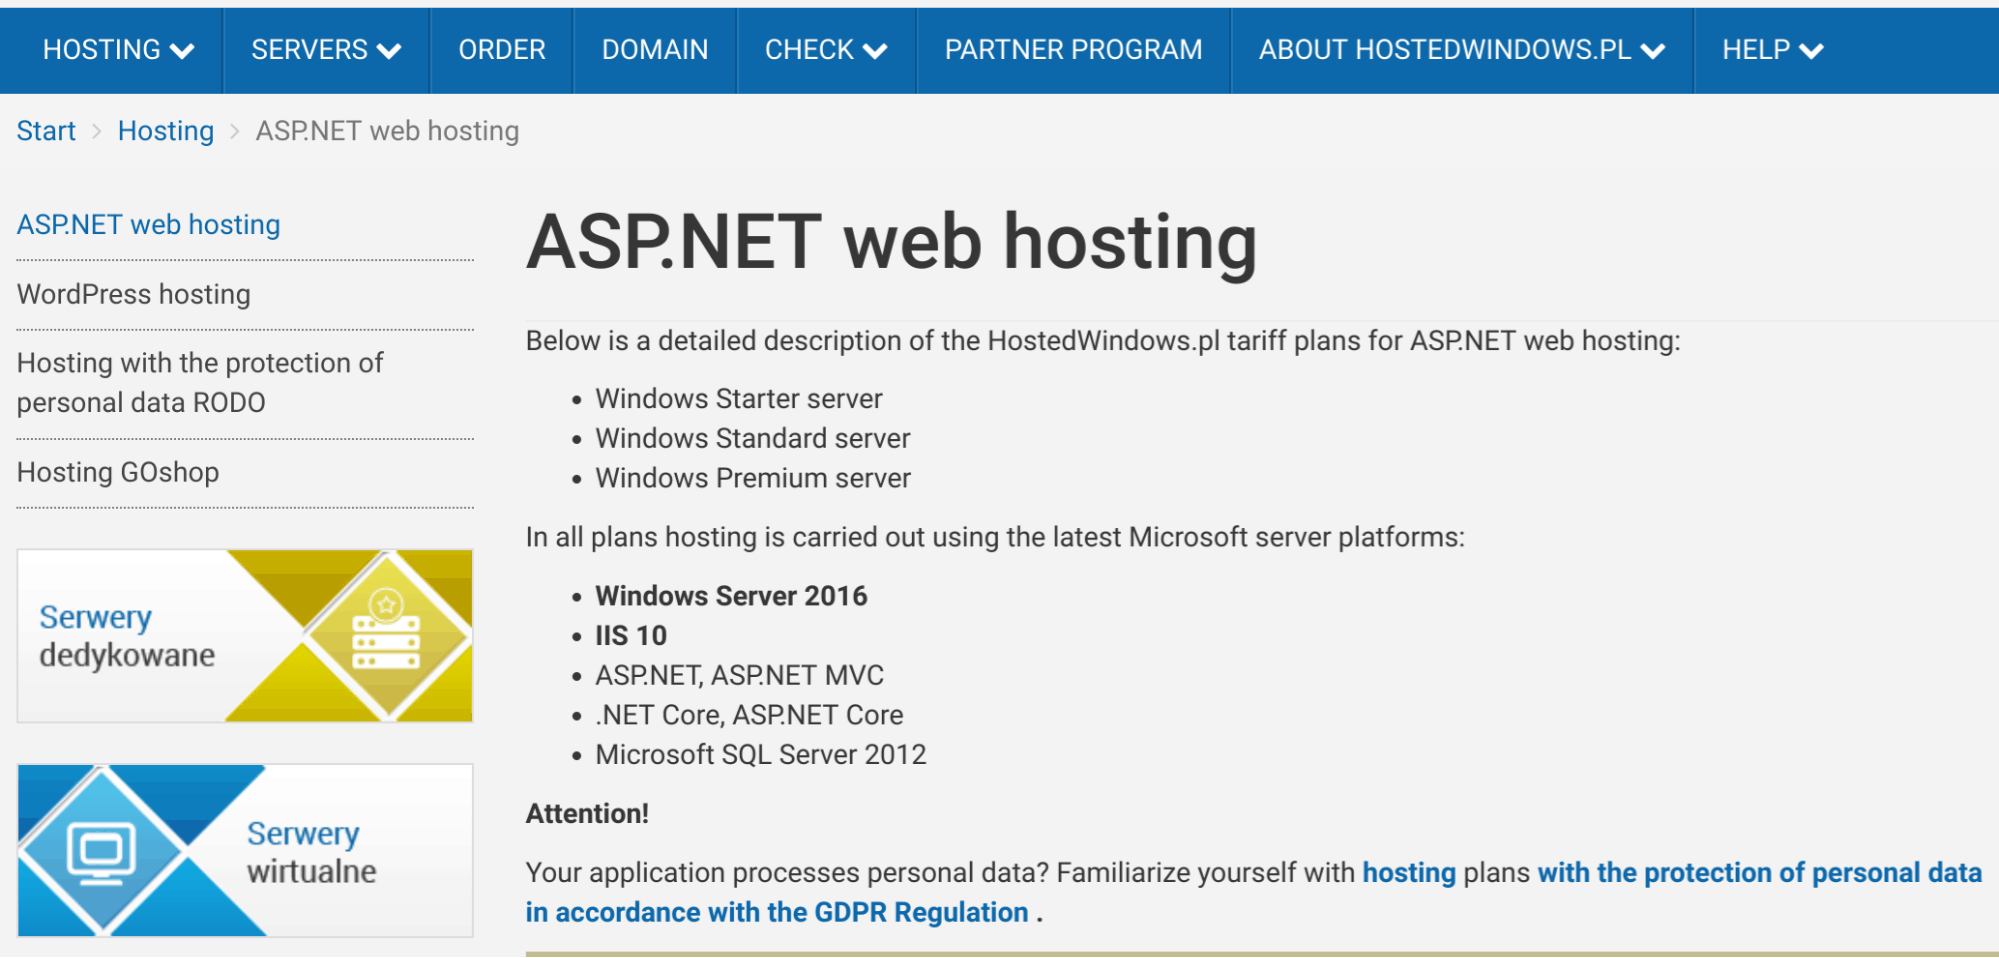 HostedWindows.pl